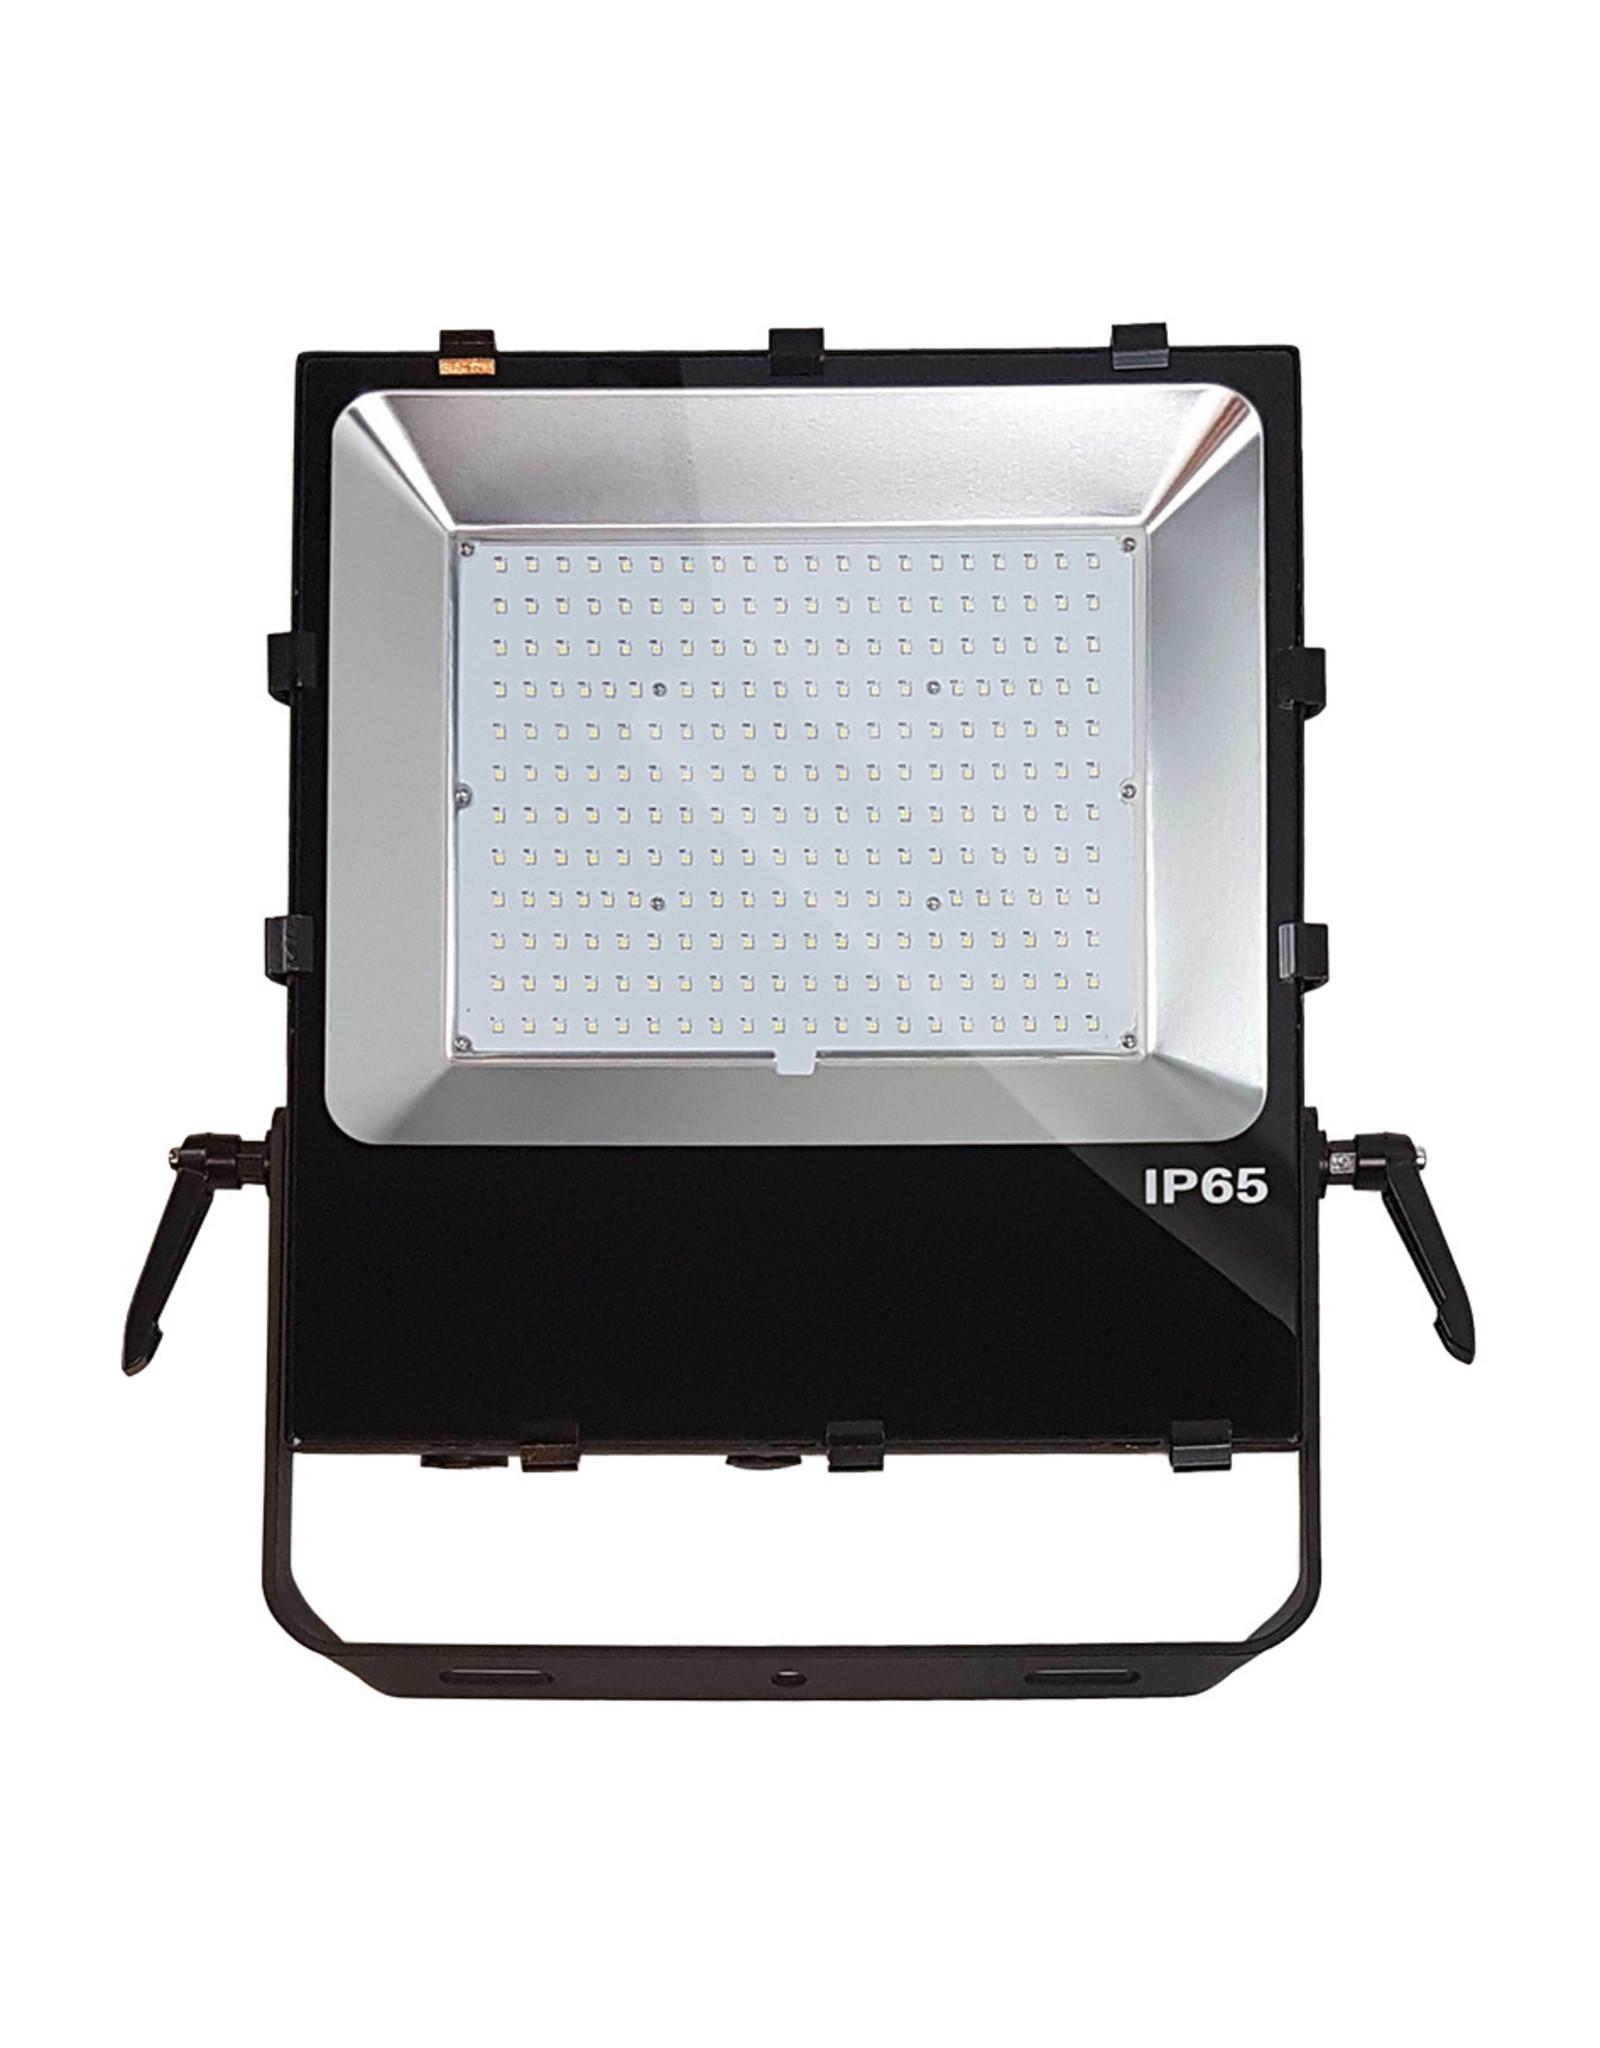 Lights Ekspoled100 - 100w flood light led - Powercon true  - 120°